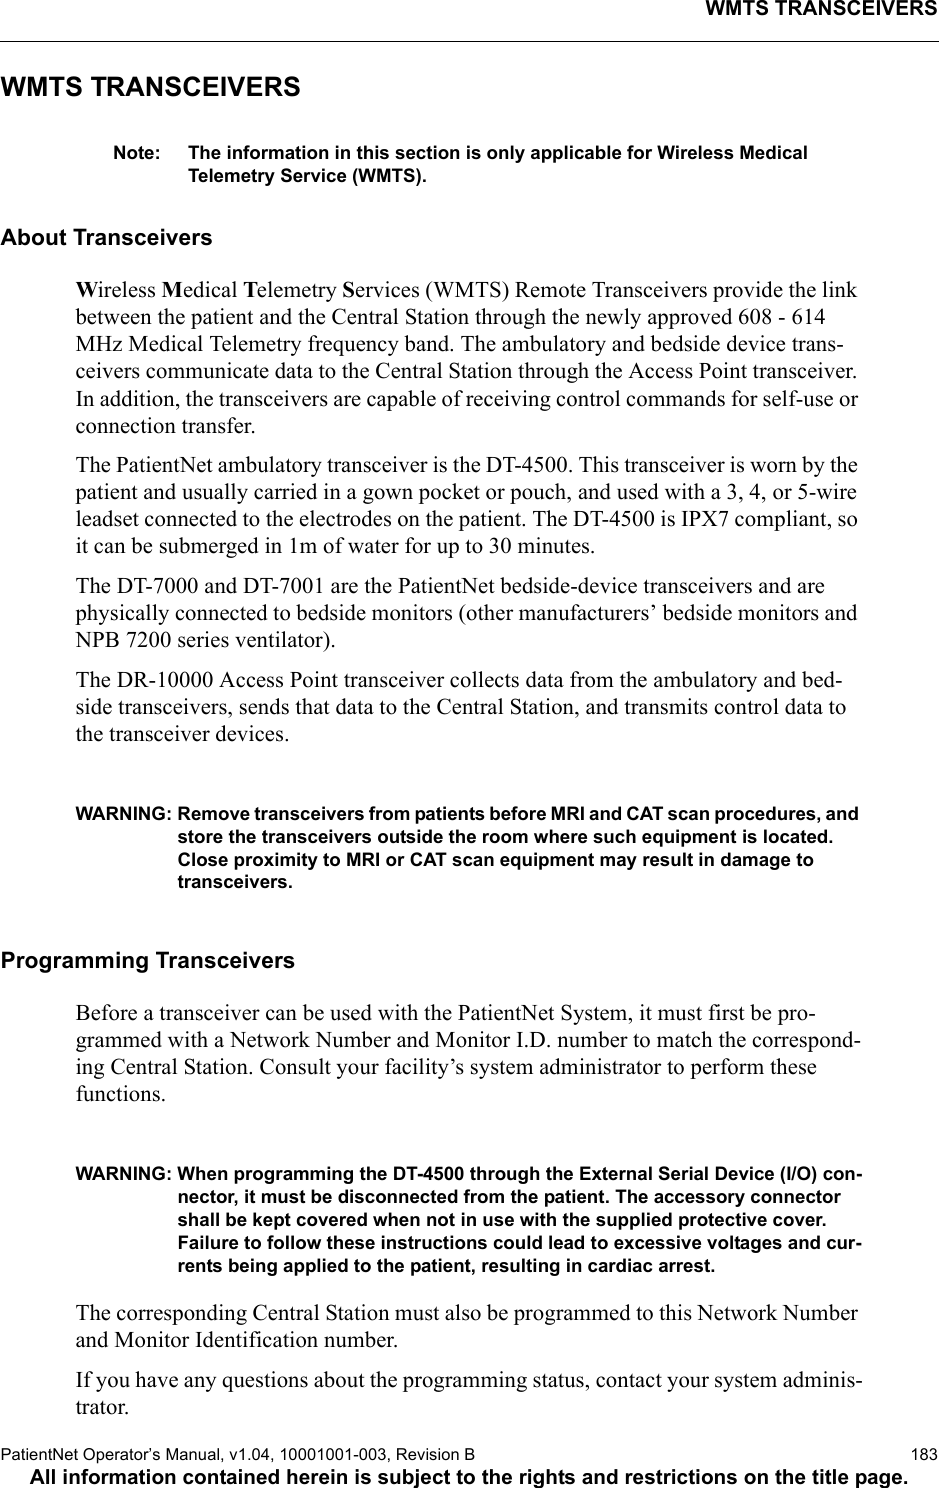 data critical 02dr 10110 wmts opennet lan user manual 20 10001001 003 b rh usermanual wiki Toshiba User Guide Manual Toshiba User Guide Manual